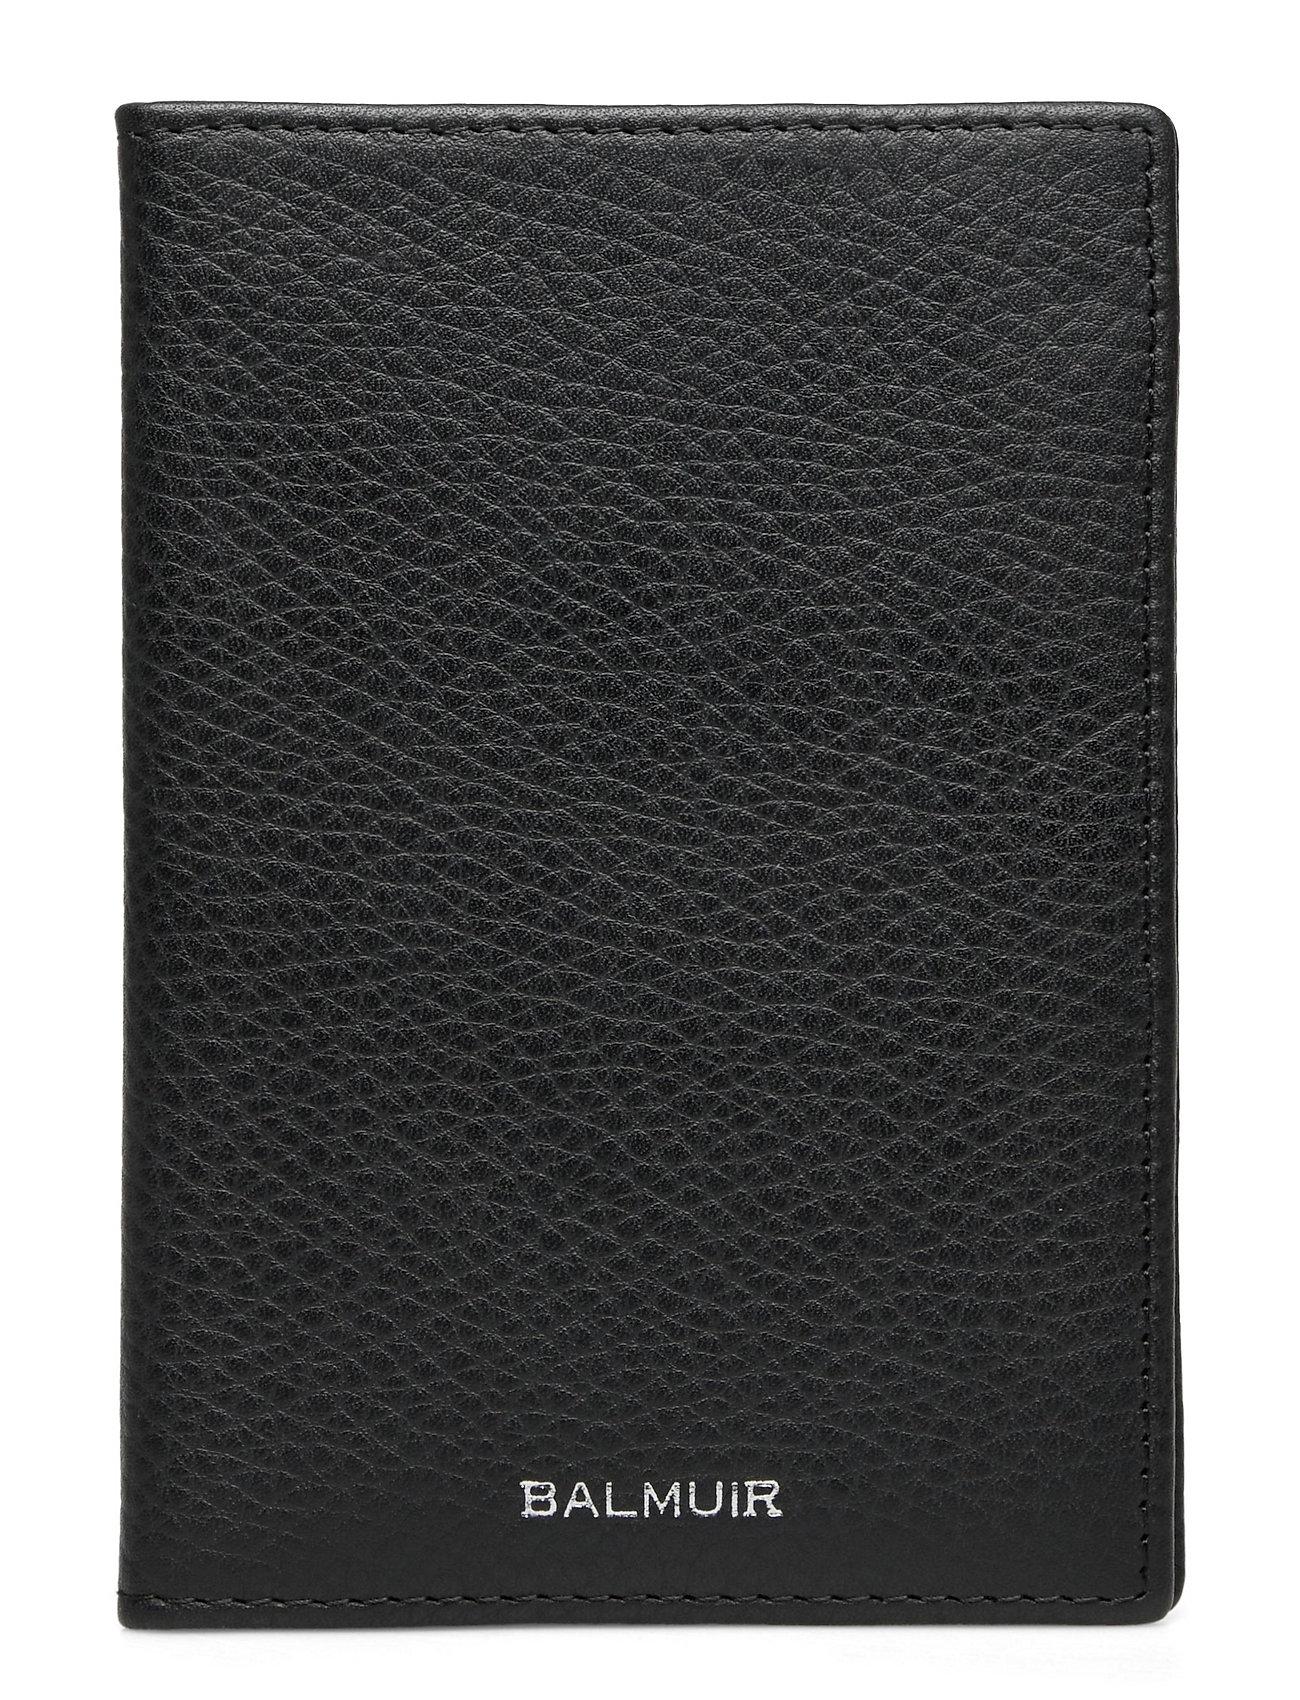 Passport Cover Accessories Wallets Classic Wallets Sort Balmuir